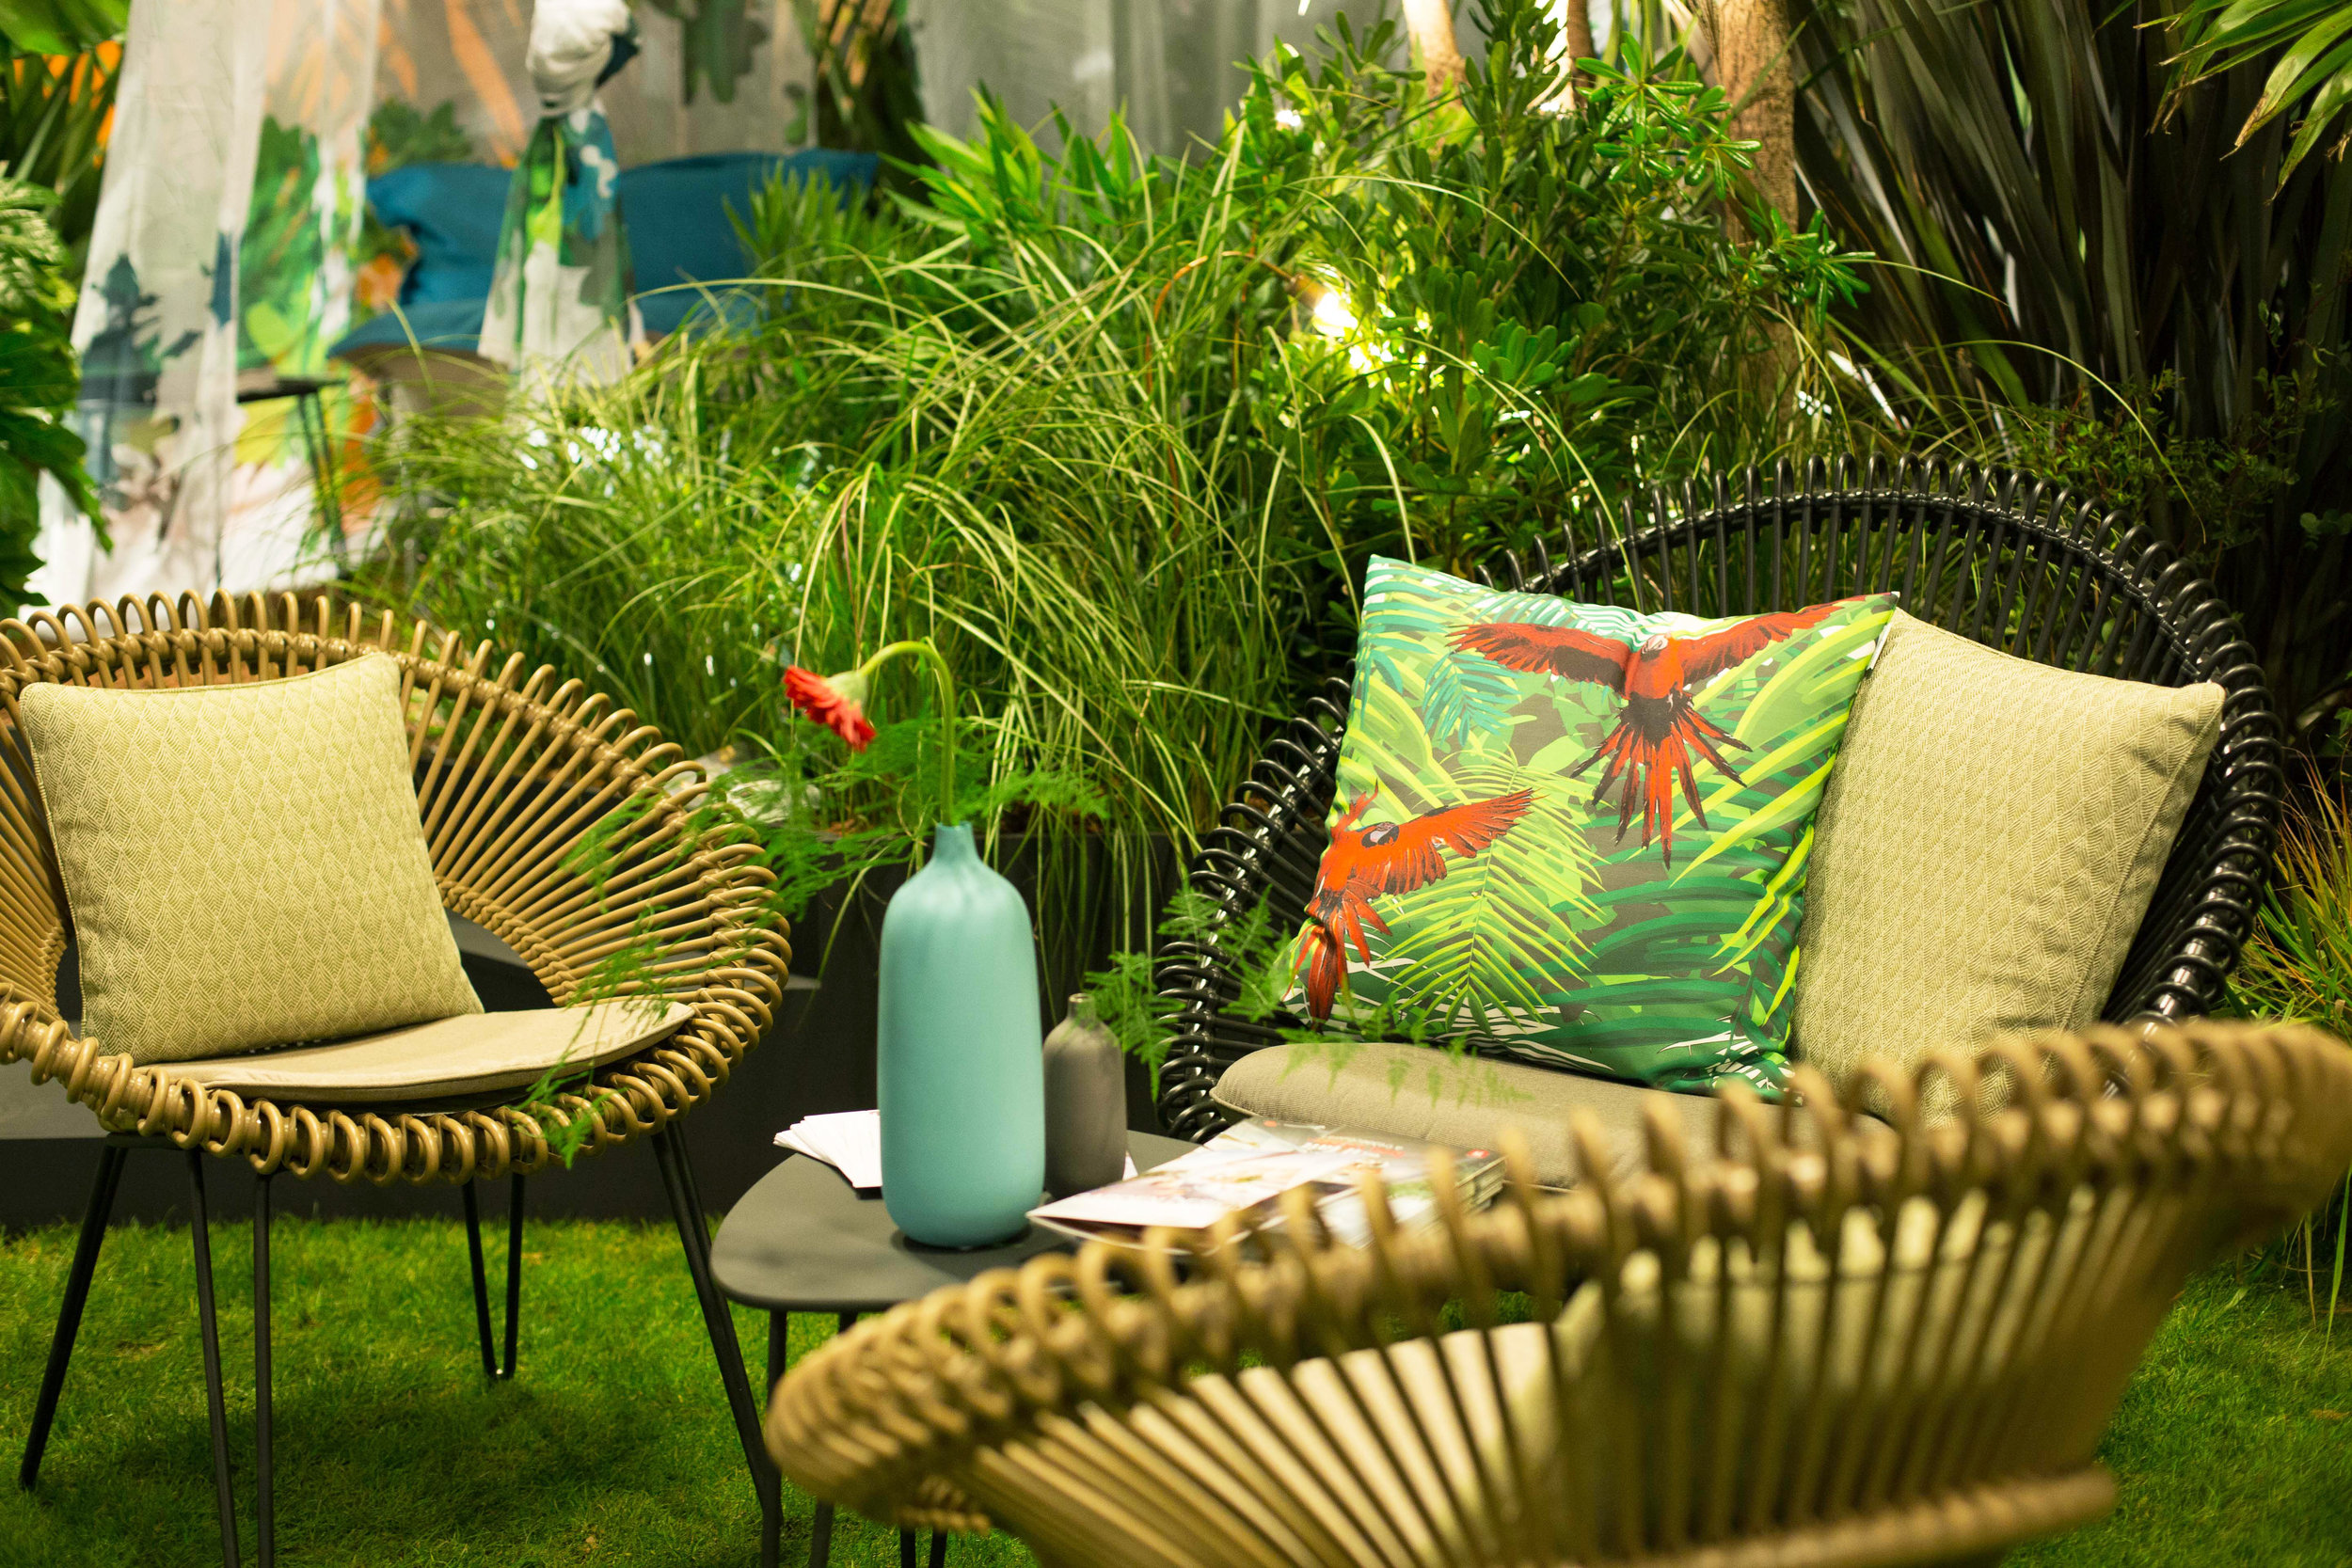 salon_equiphotel_paris_terrasses_jardins_outdoor_garden_christophe_gautrand_paysagiste_2.jpg